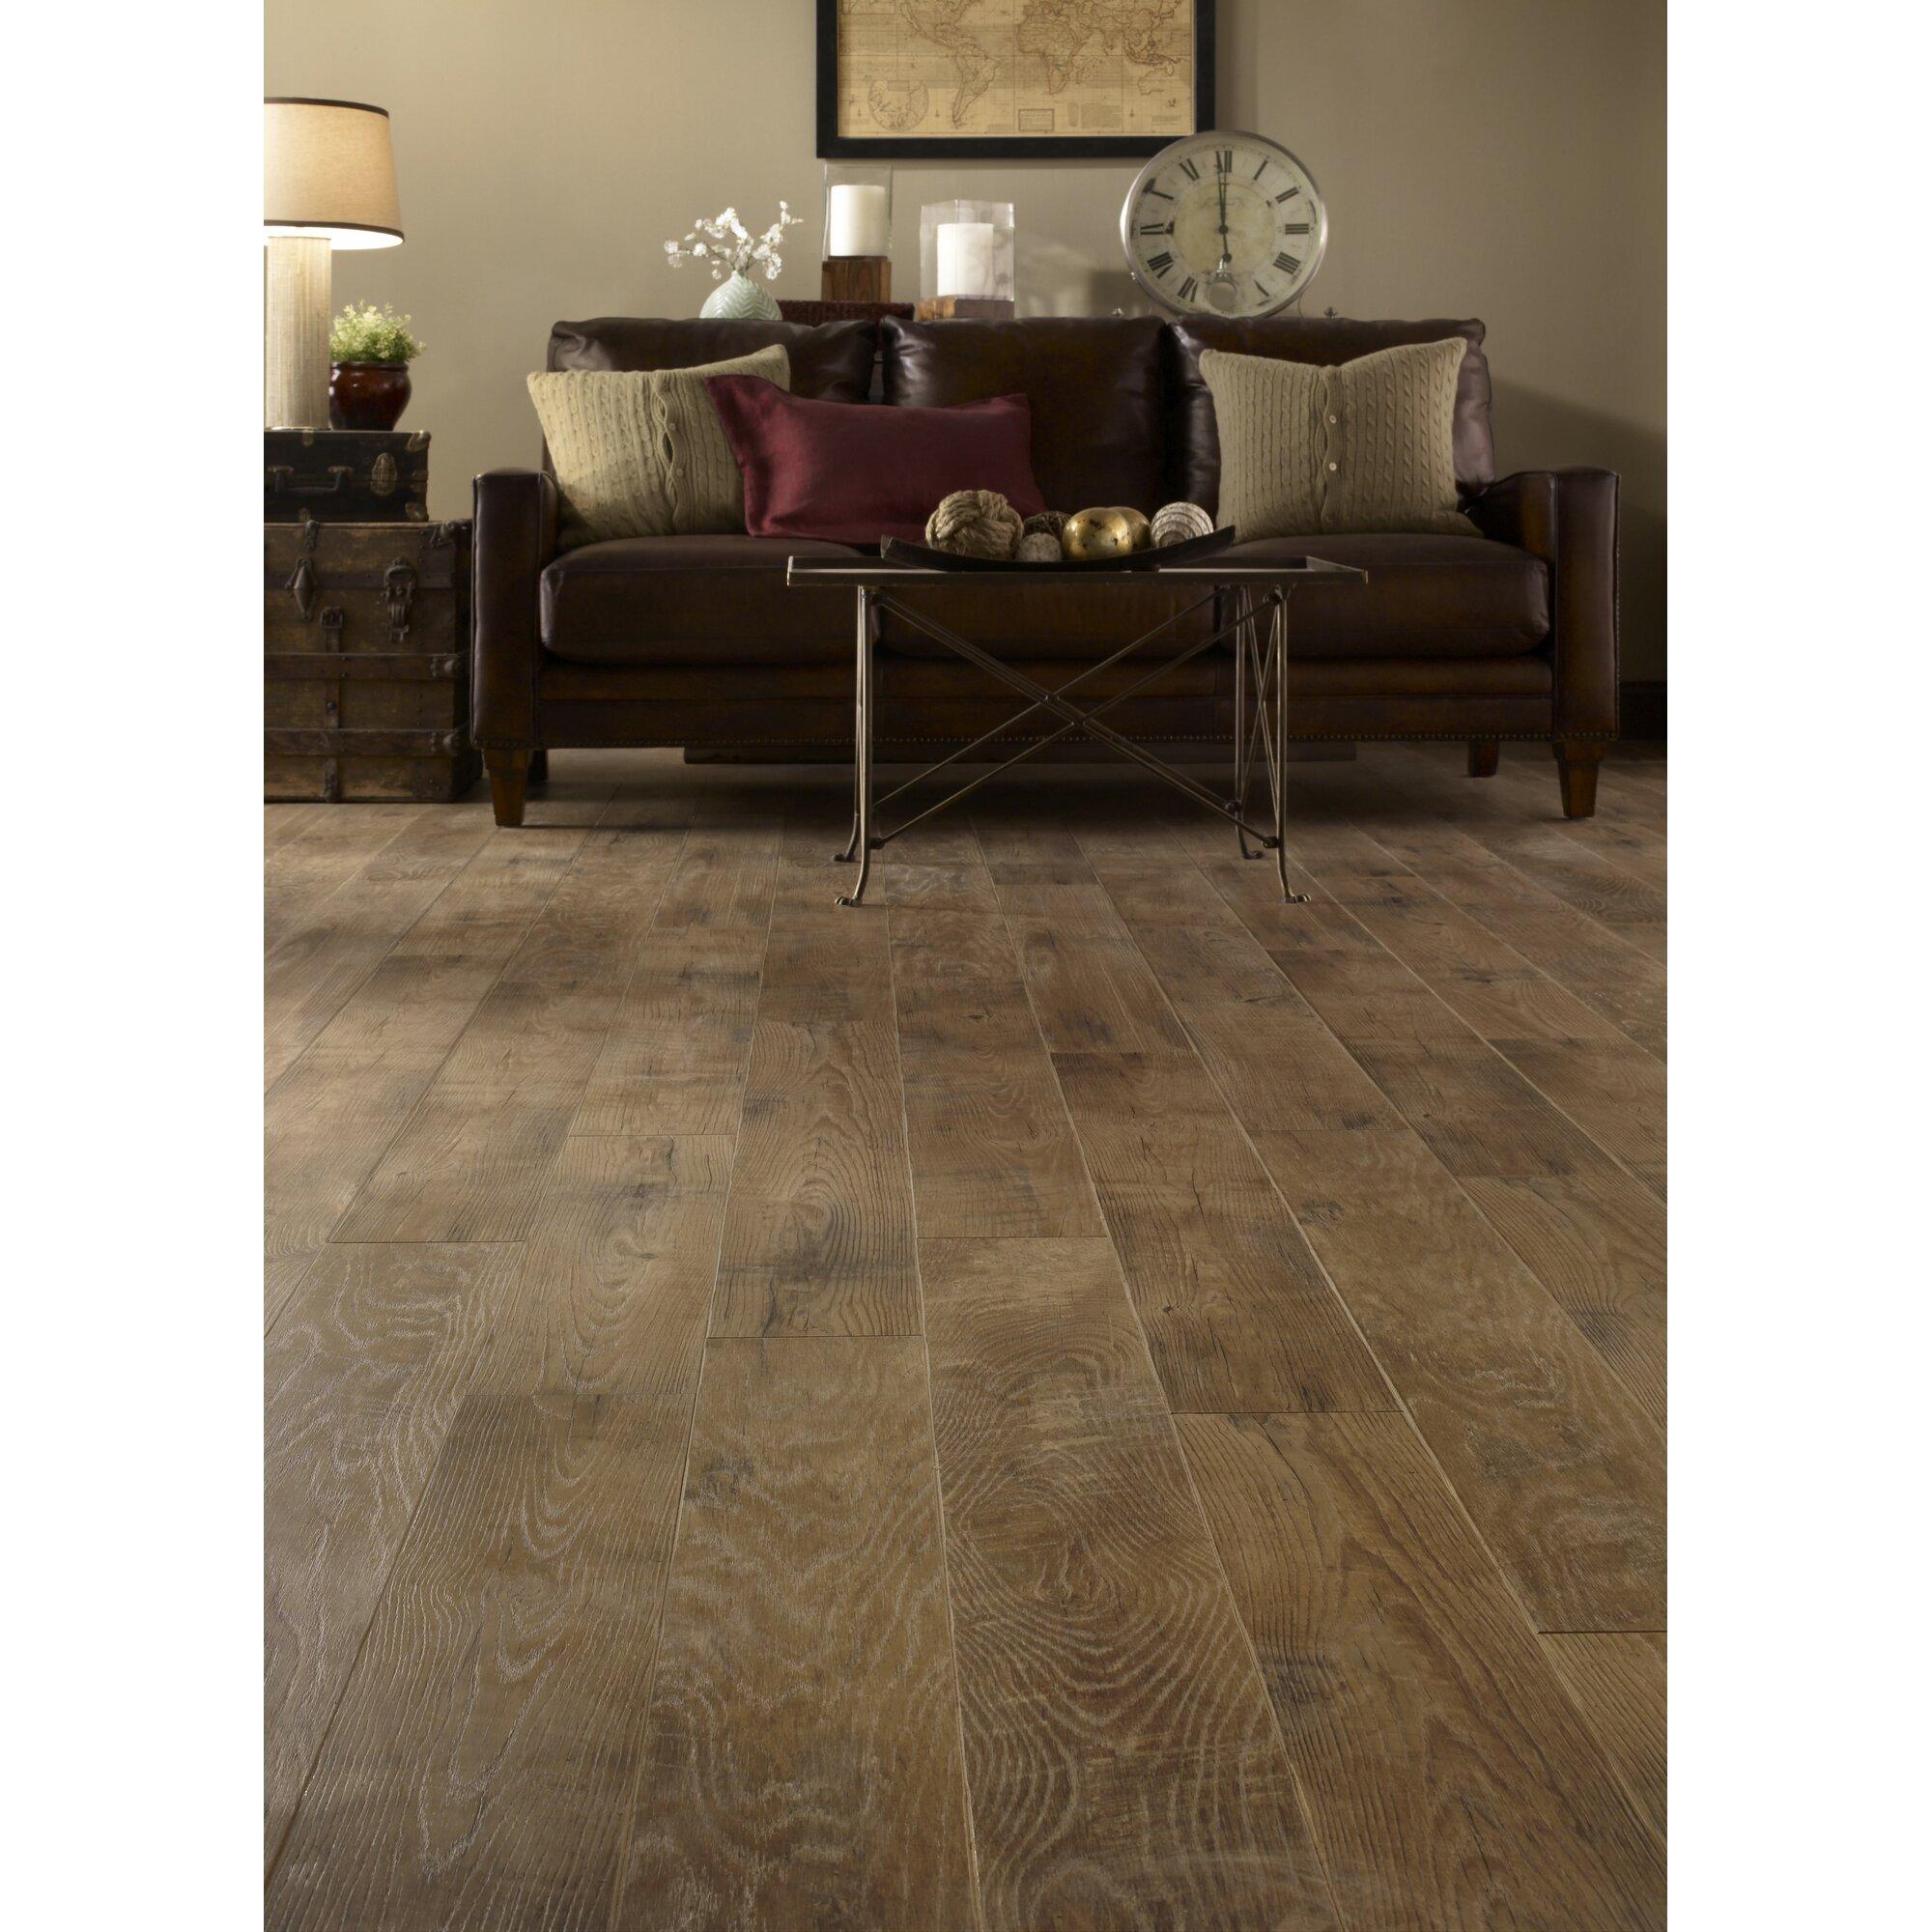 Oak Laminate Flooring balterio grandeur wellington oak laminate flooring Restoration 6 X 51 X 12mm Oak Laminate